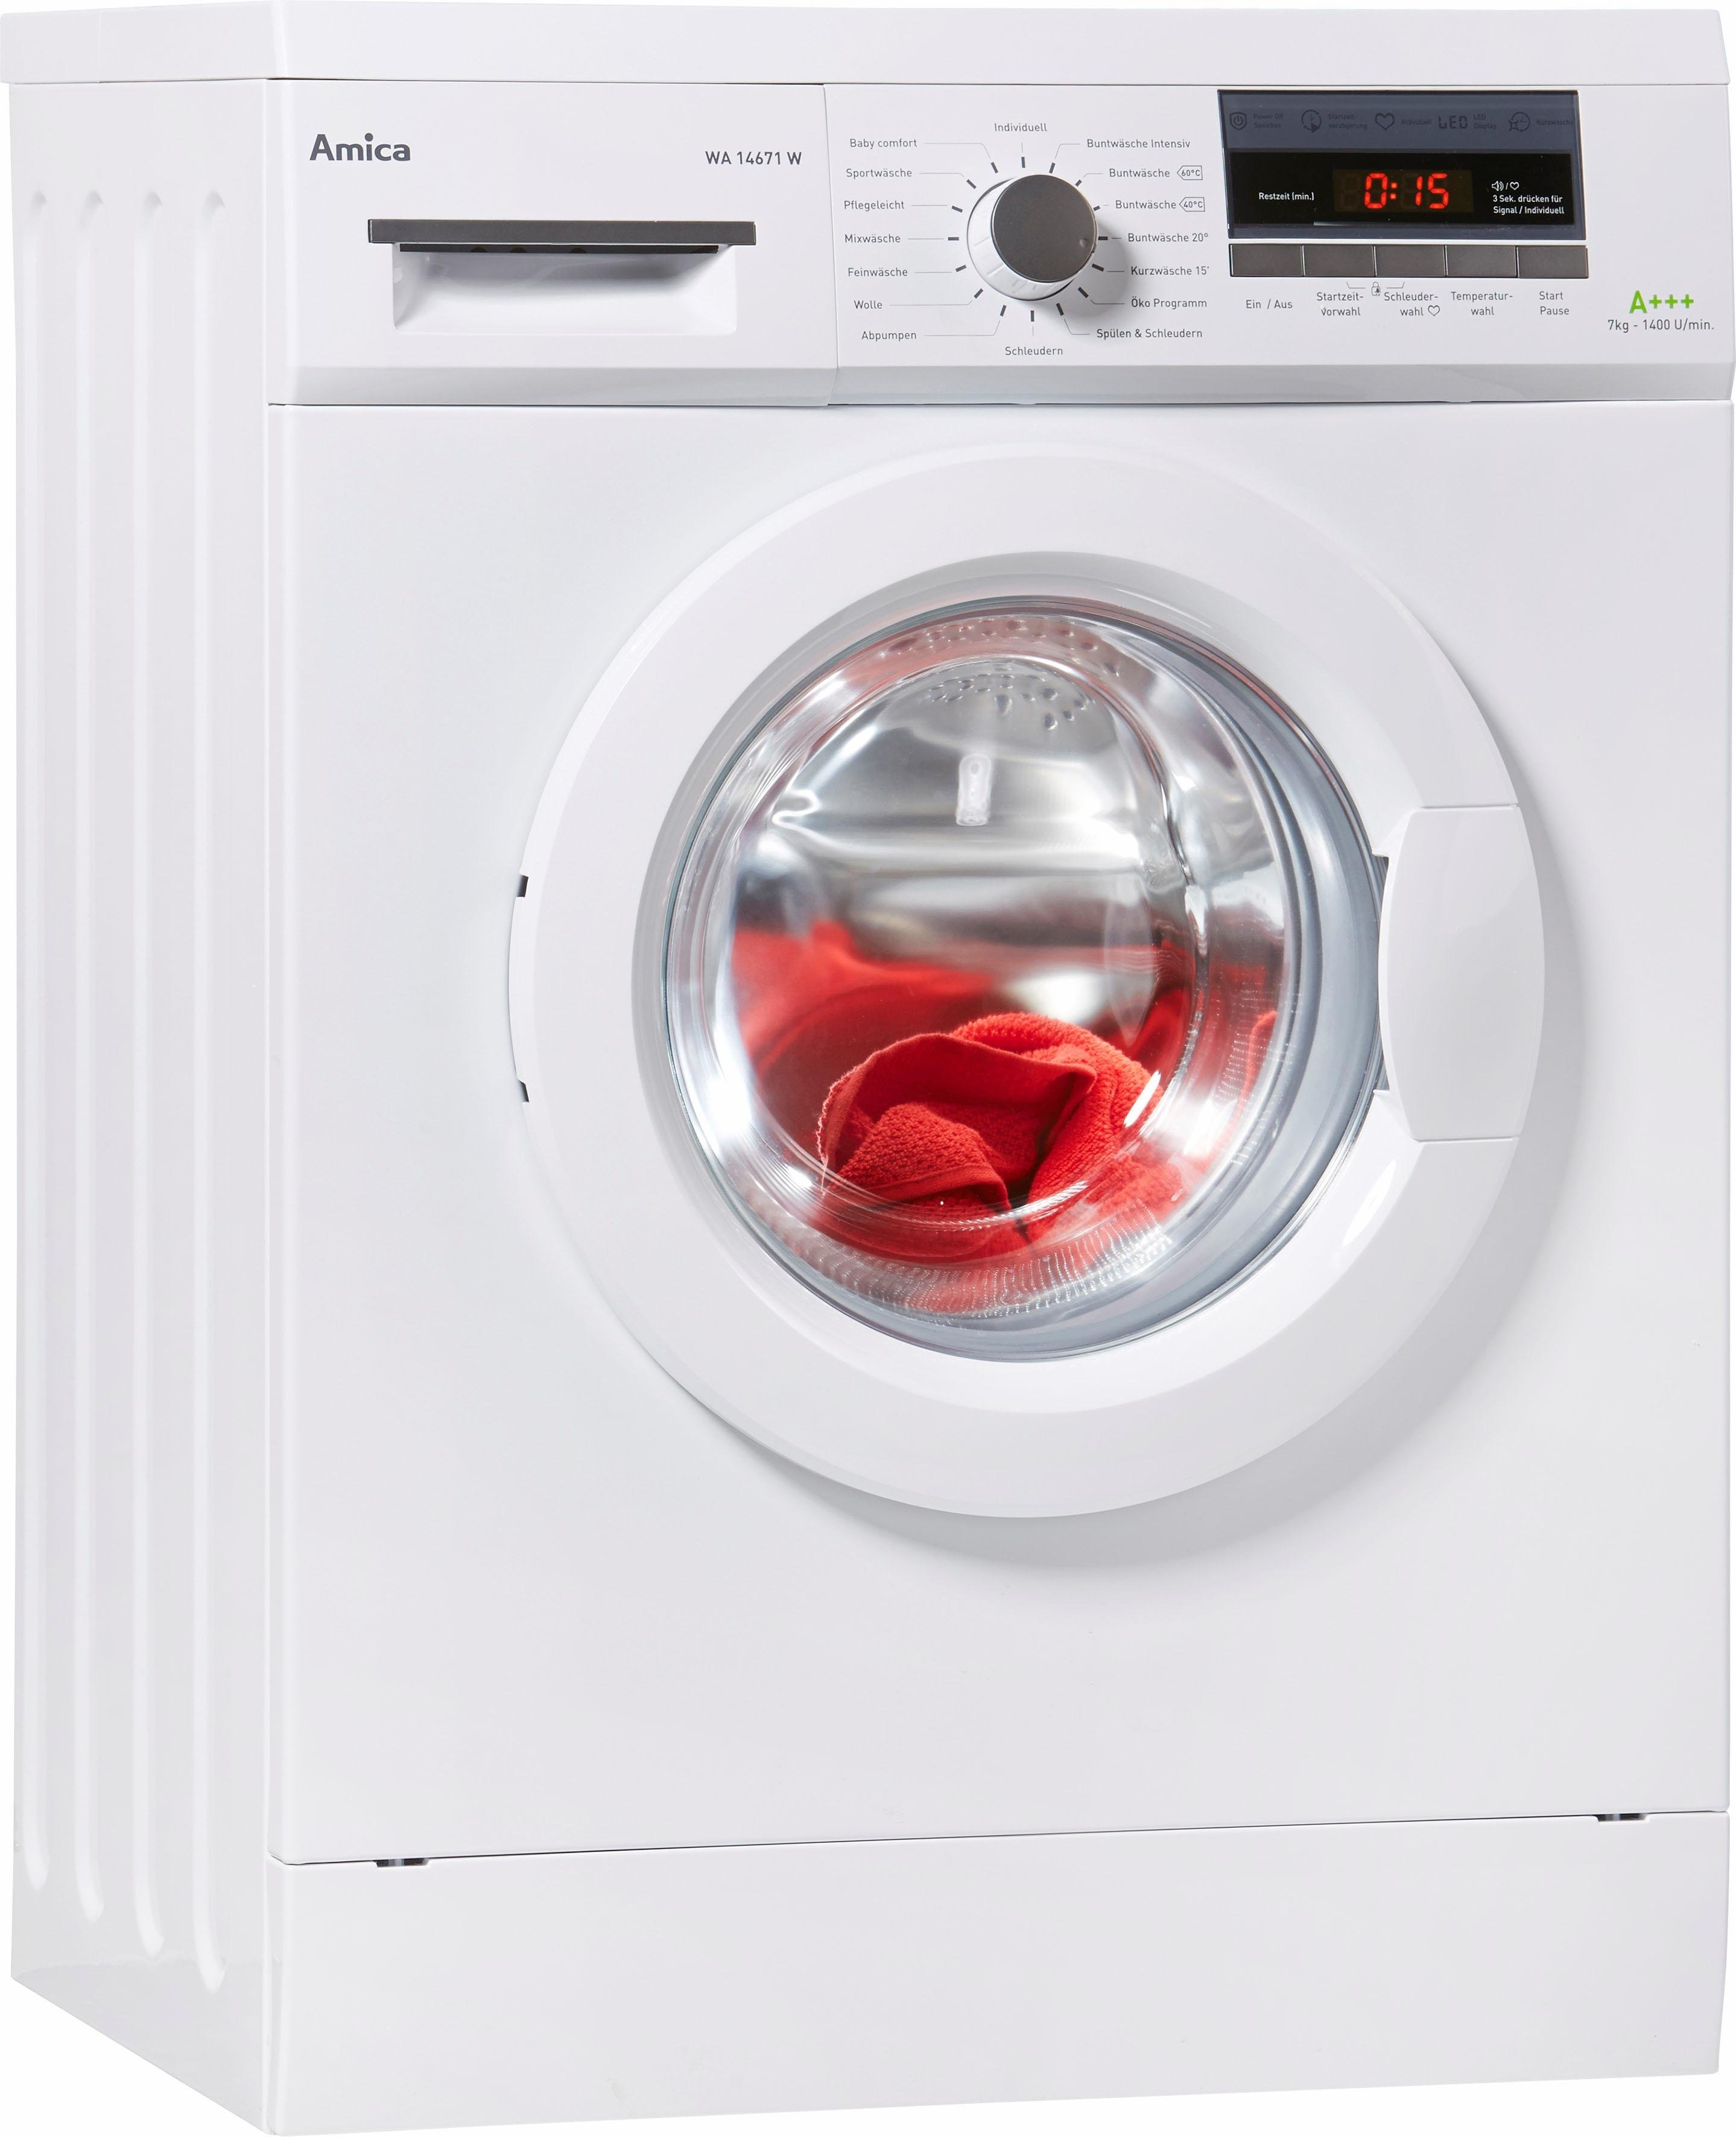 Amica wasmachine WA 14671 W bij OTTO online kopen